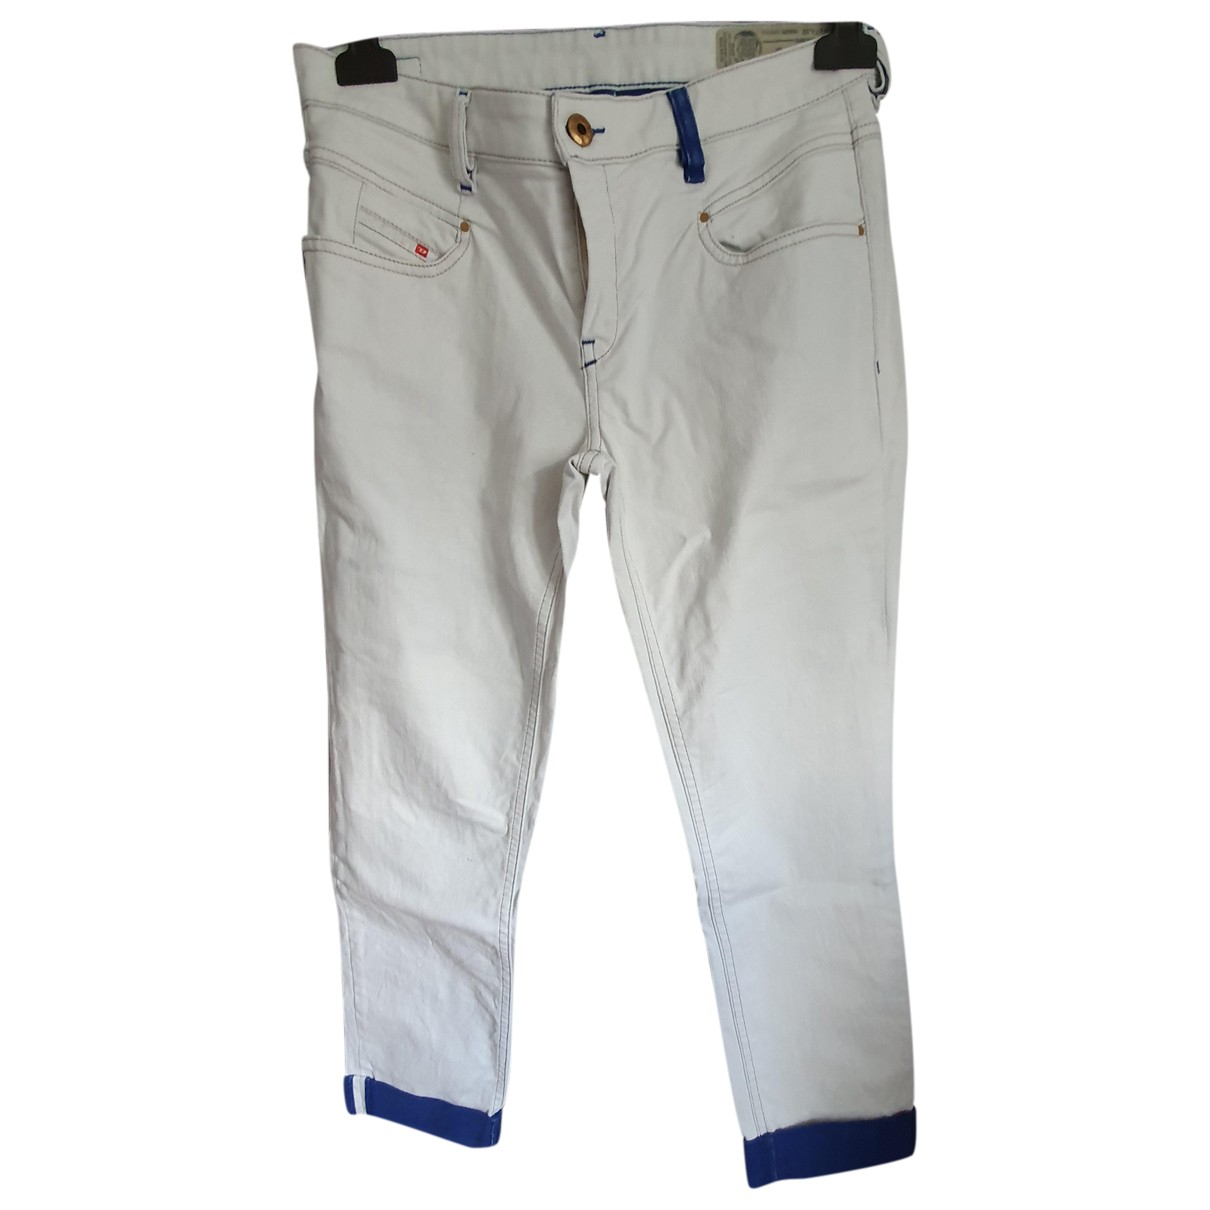 Diesel - Pantalon   pour femme en denim - blanc